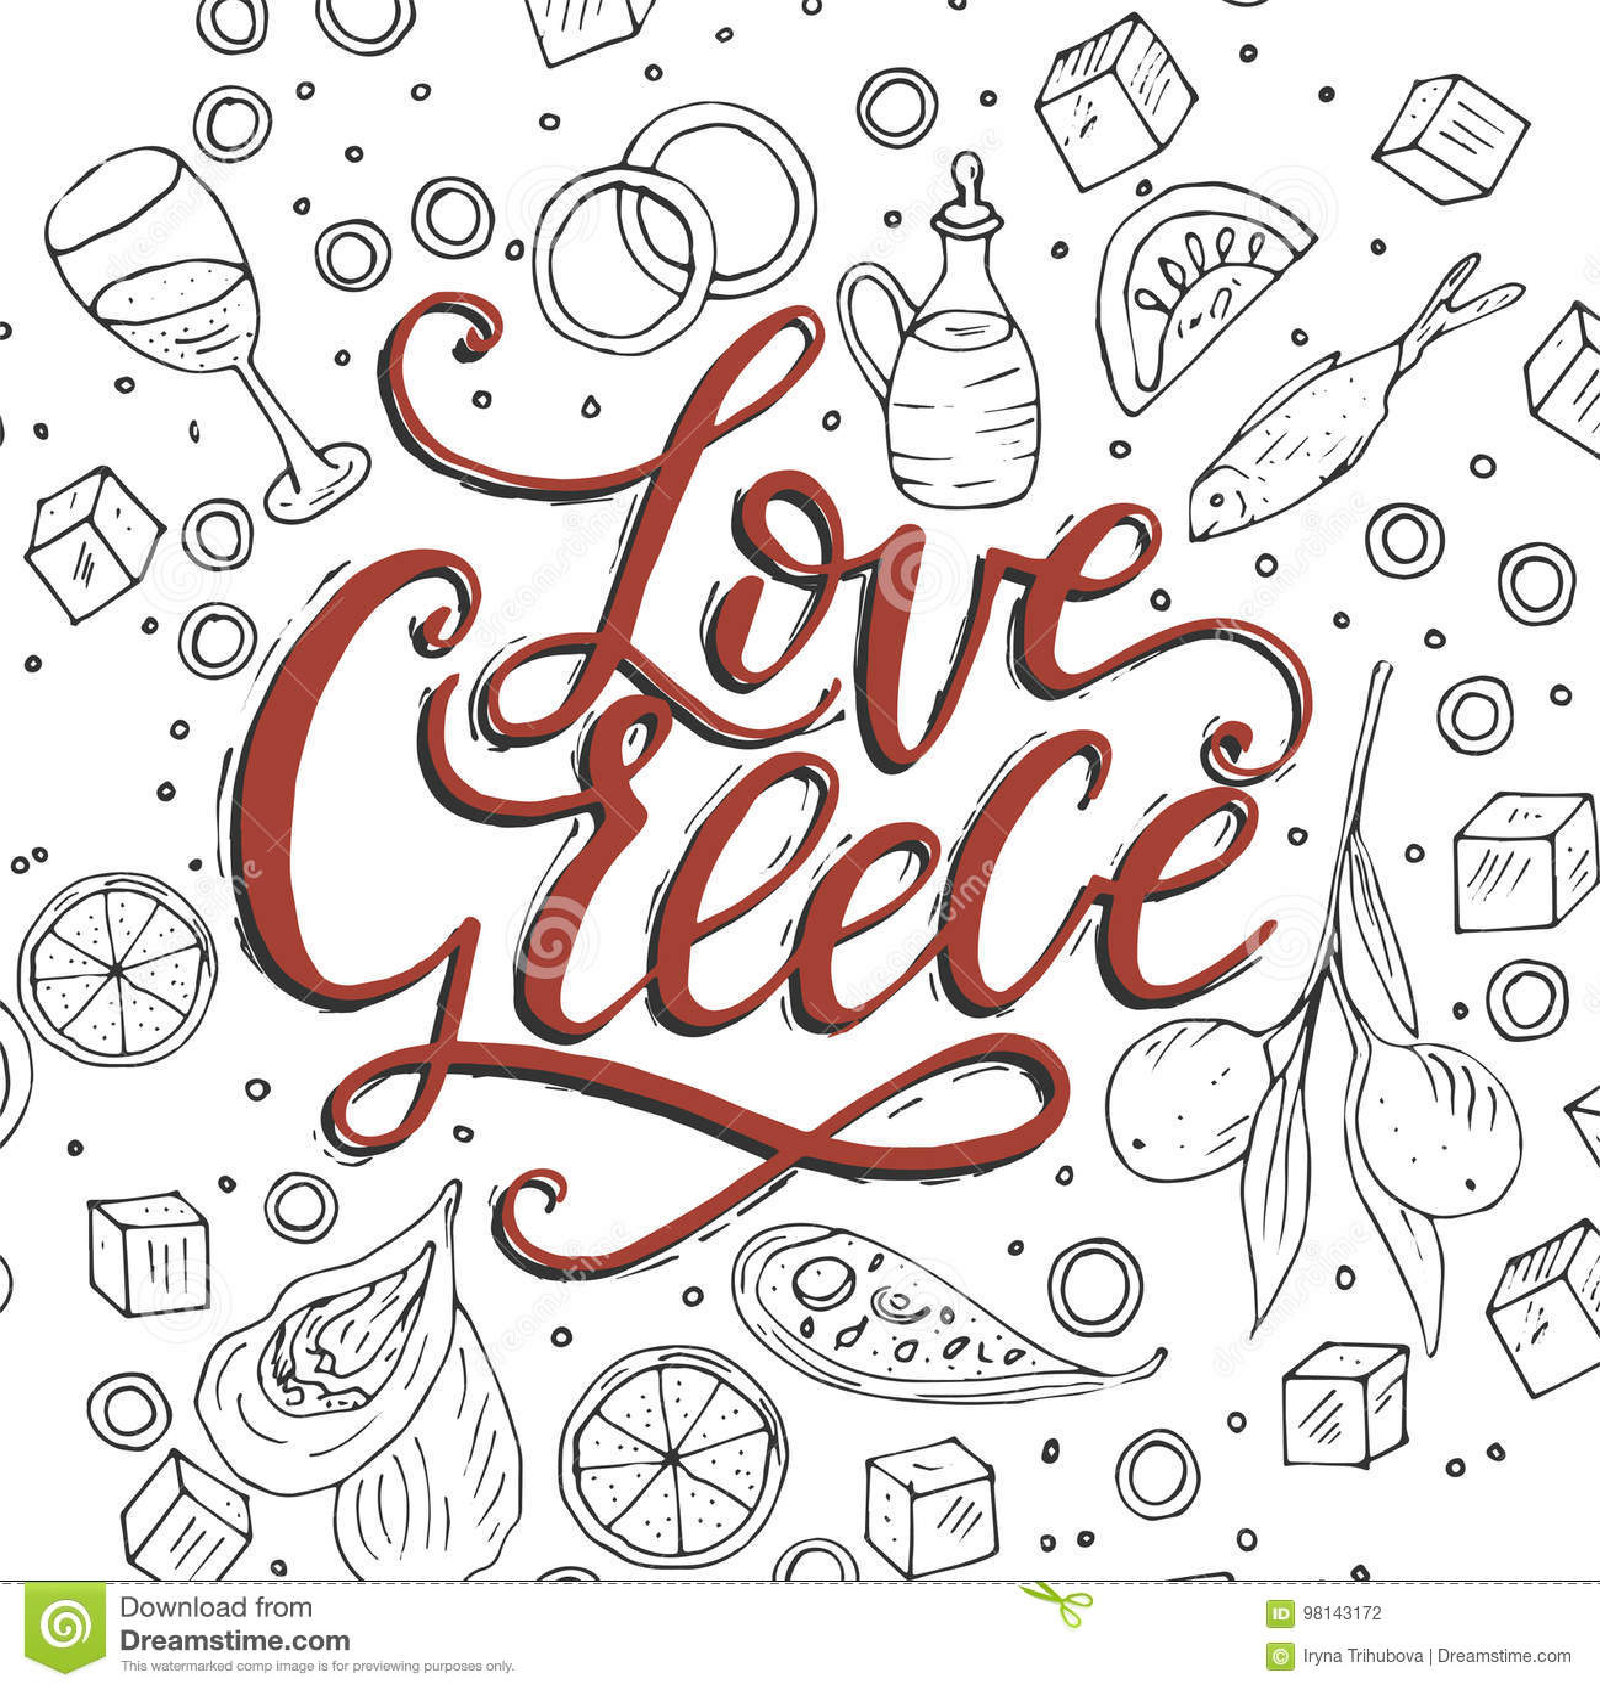 Love Greece Lettering Handdrawn Quoten Stock Vector Illustration